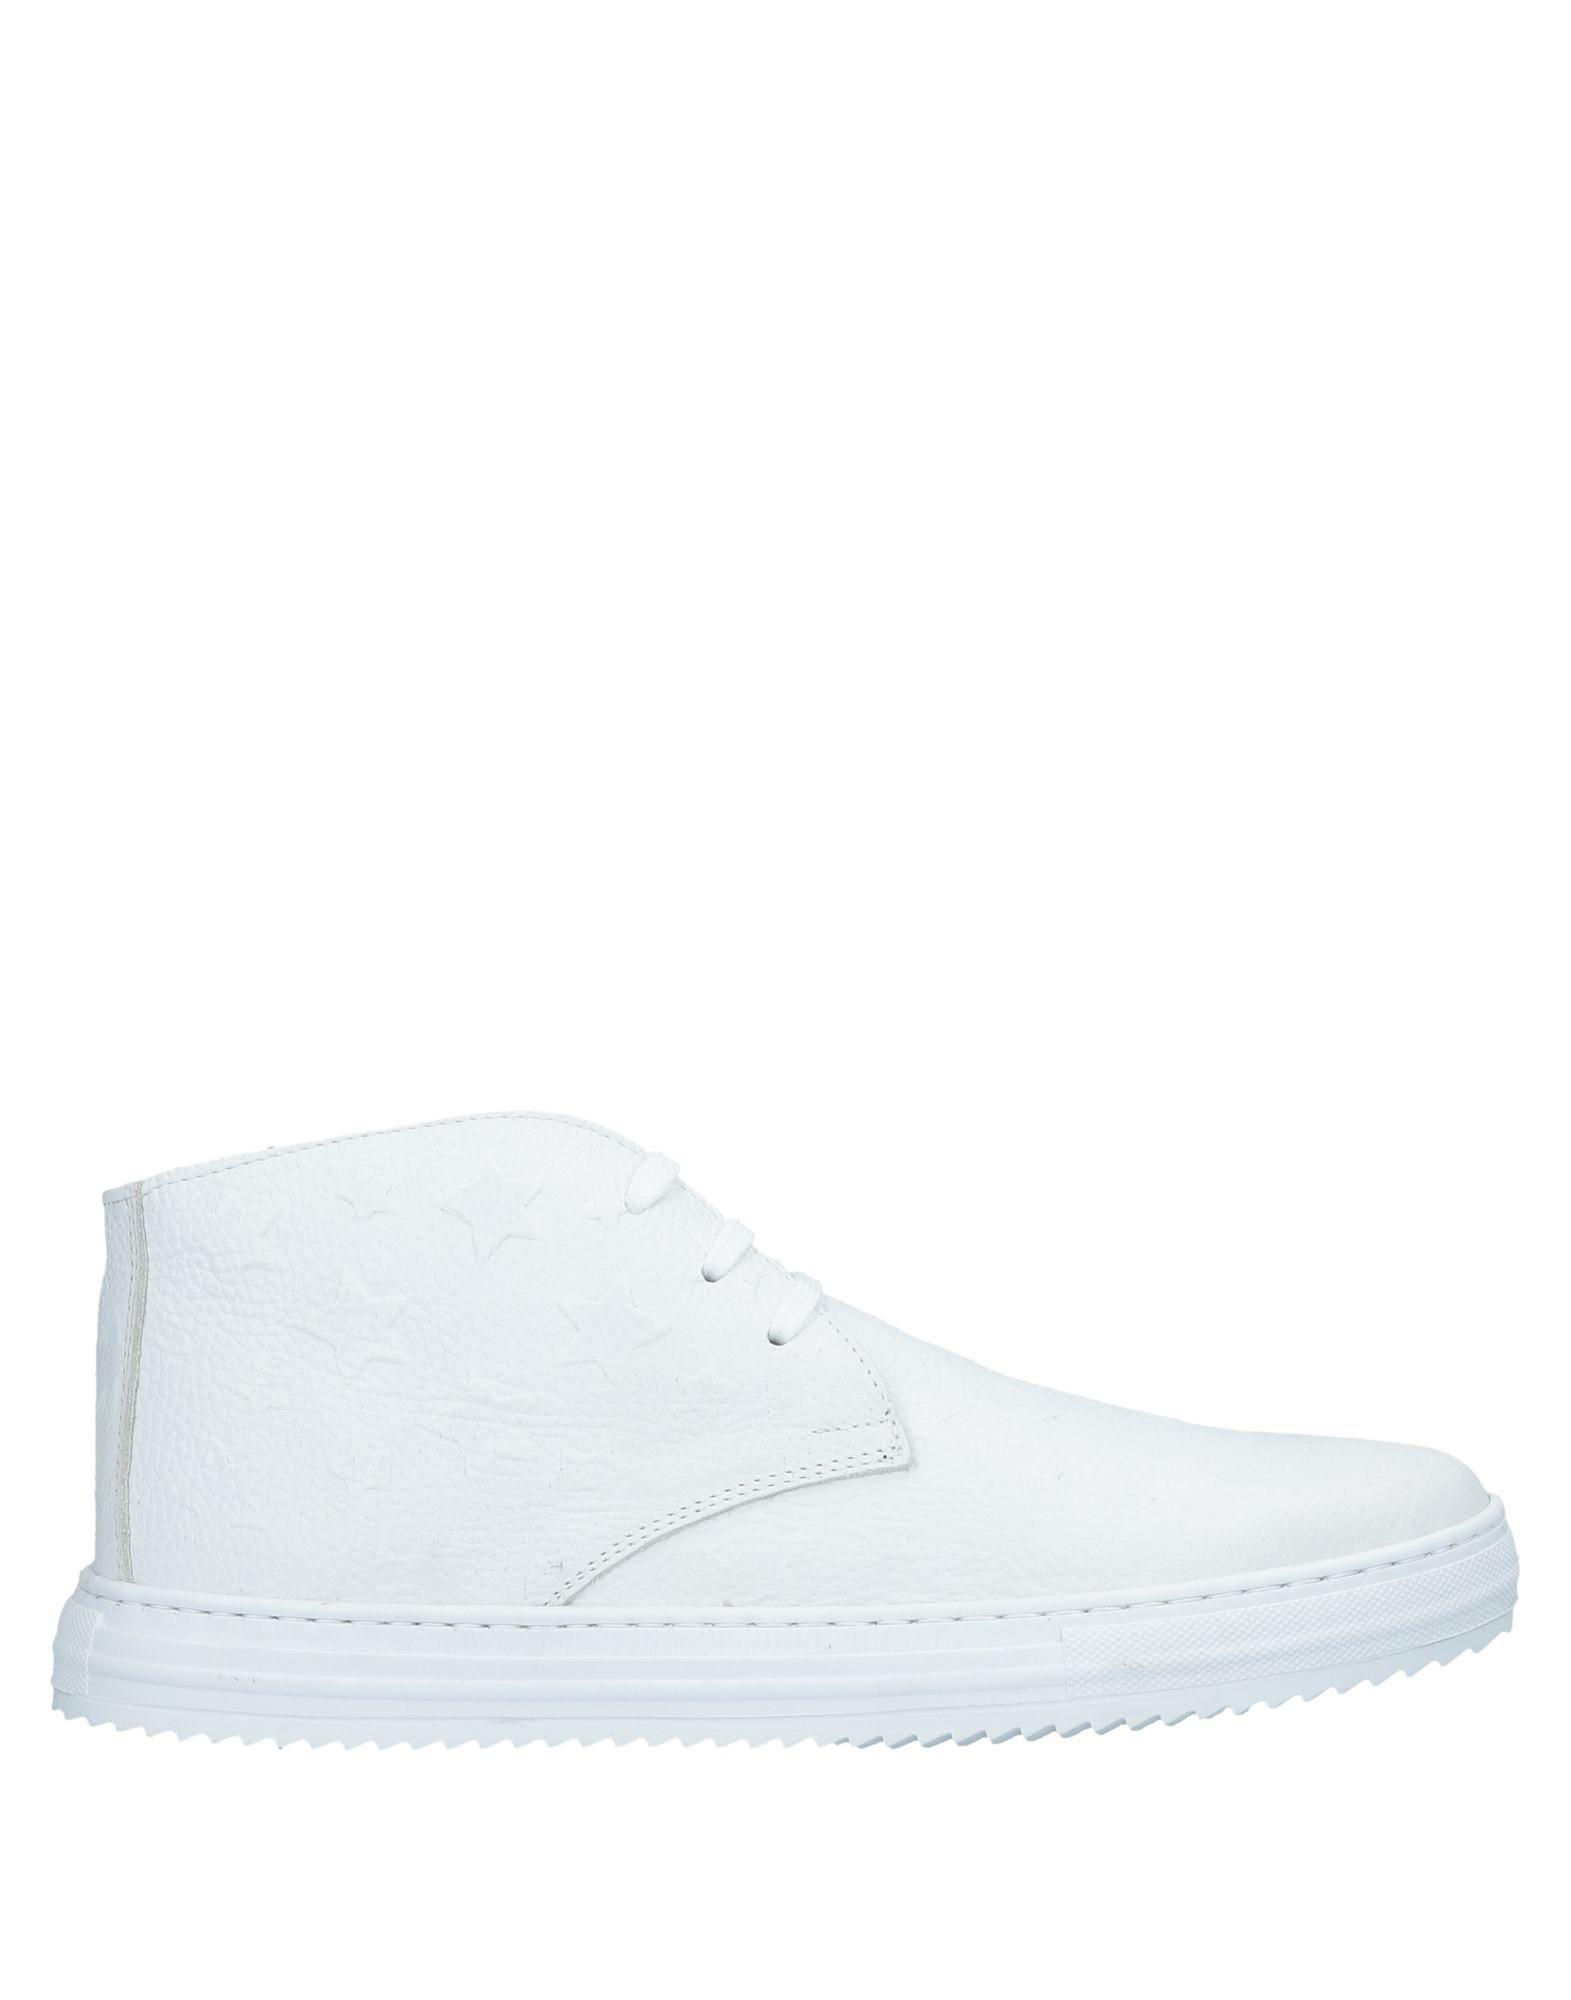 Sneakers Fratelli Circondato Uomo - 11521089NS